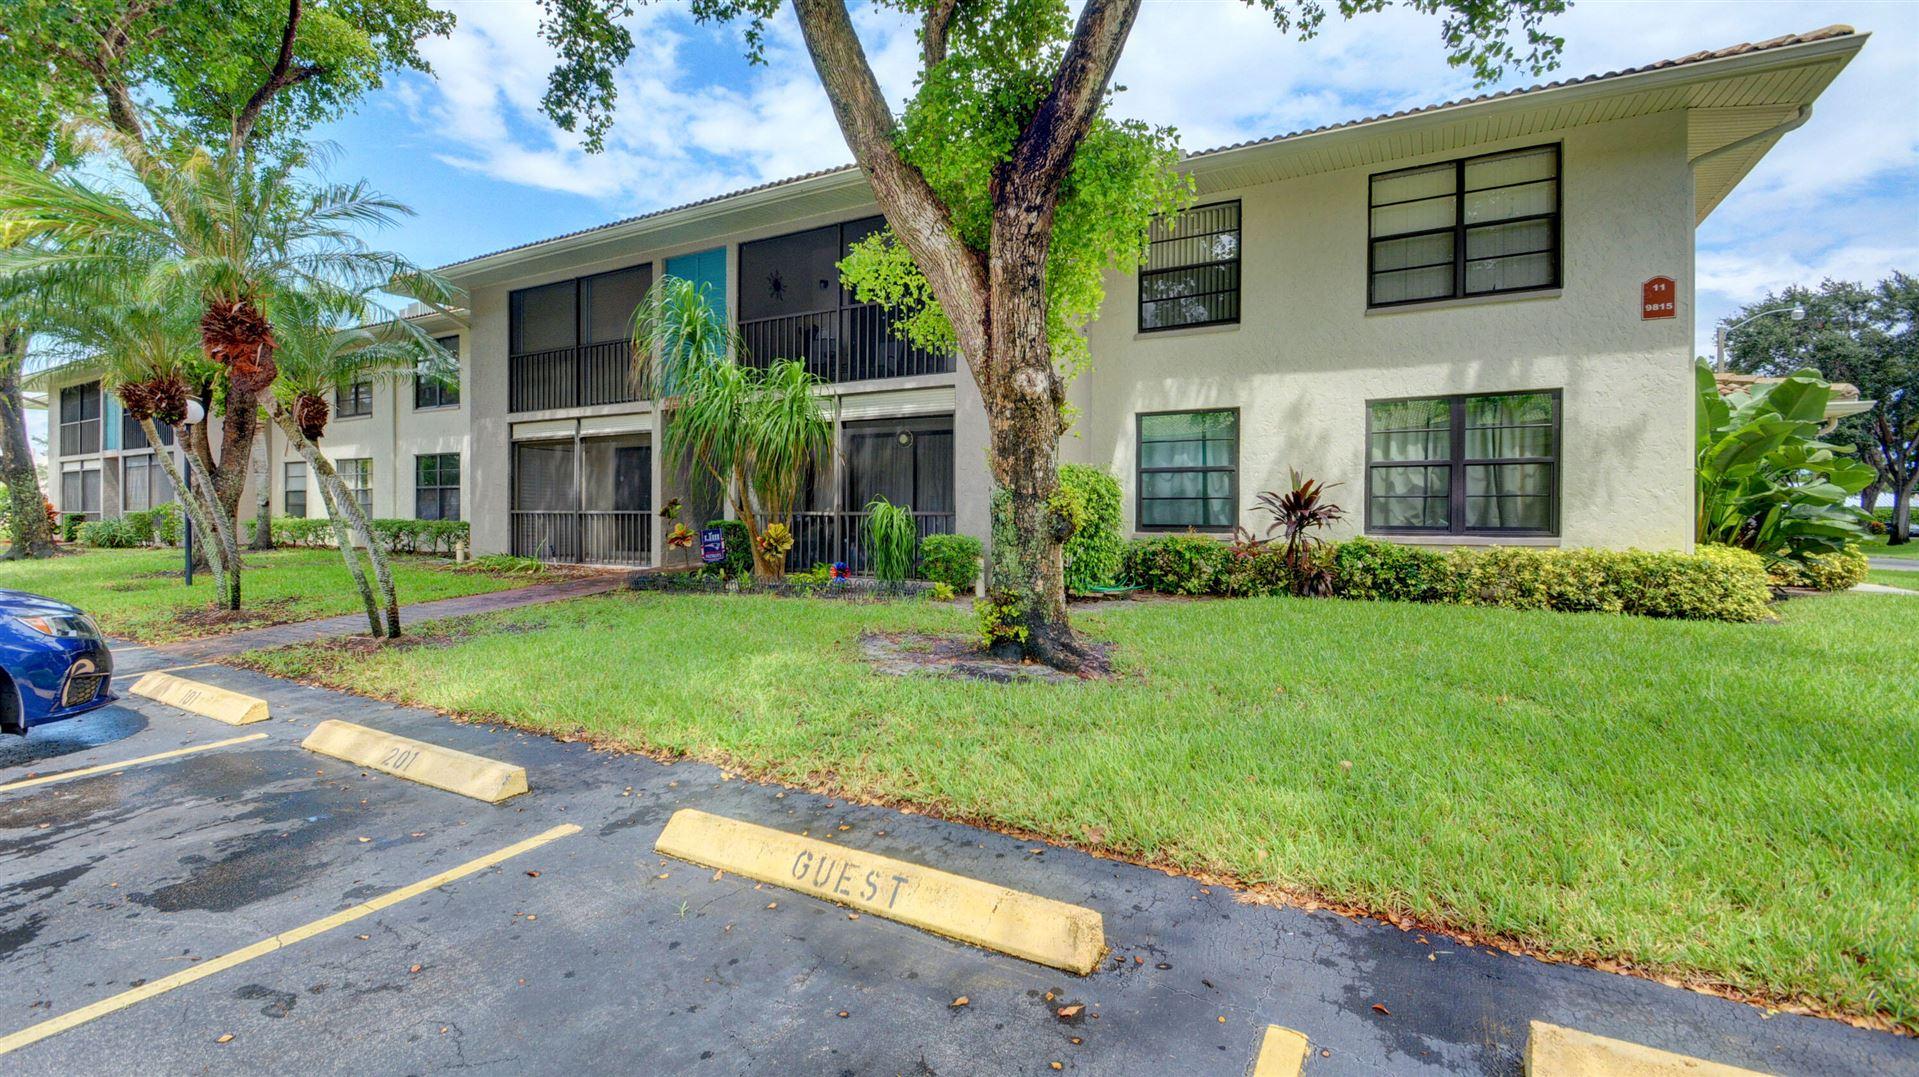 9815 Pineapple Tree Dr #103, Boynton Beach, FL 33436 - MLS#: RX-10746243